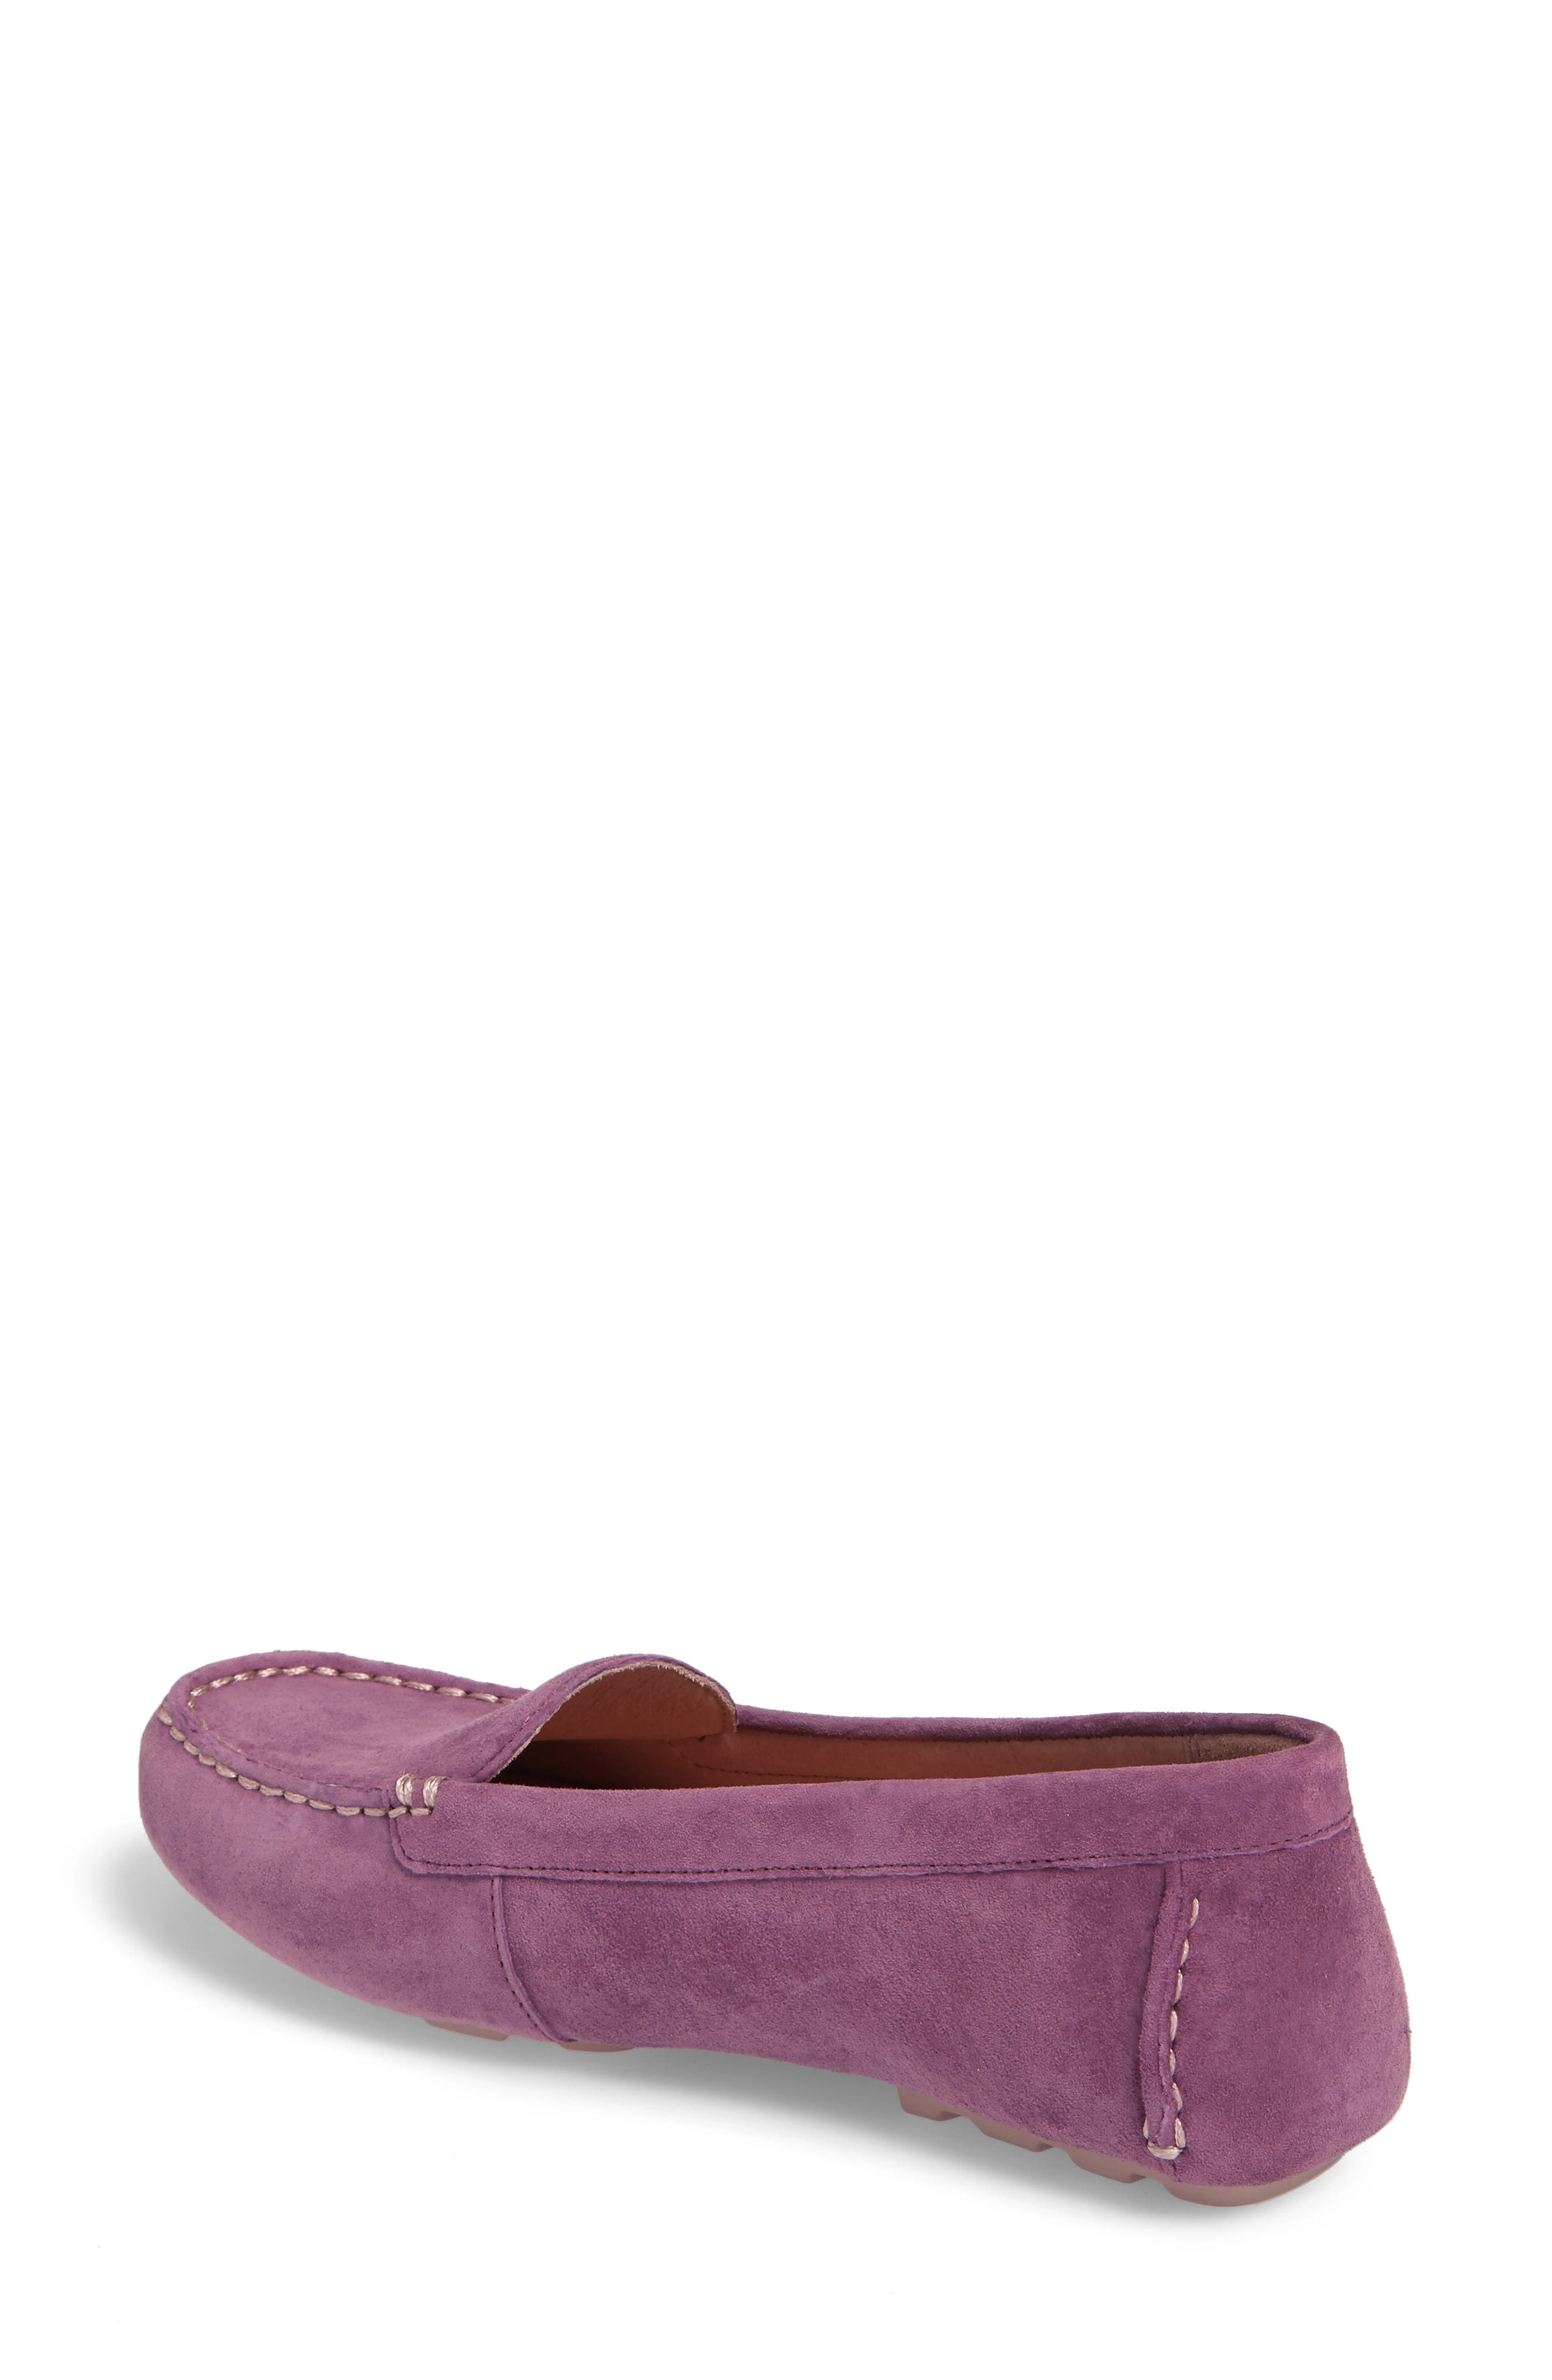 Alternate Image 2  - UGG® Milana Moc Toe Flat (Women)